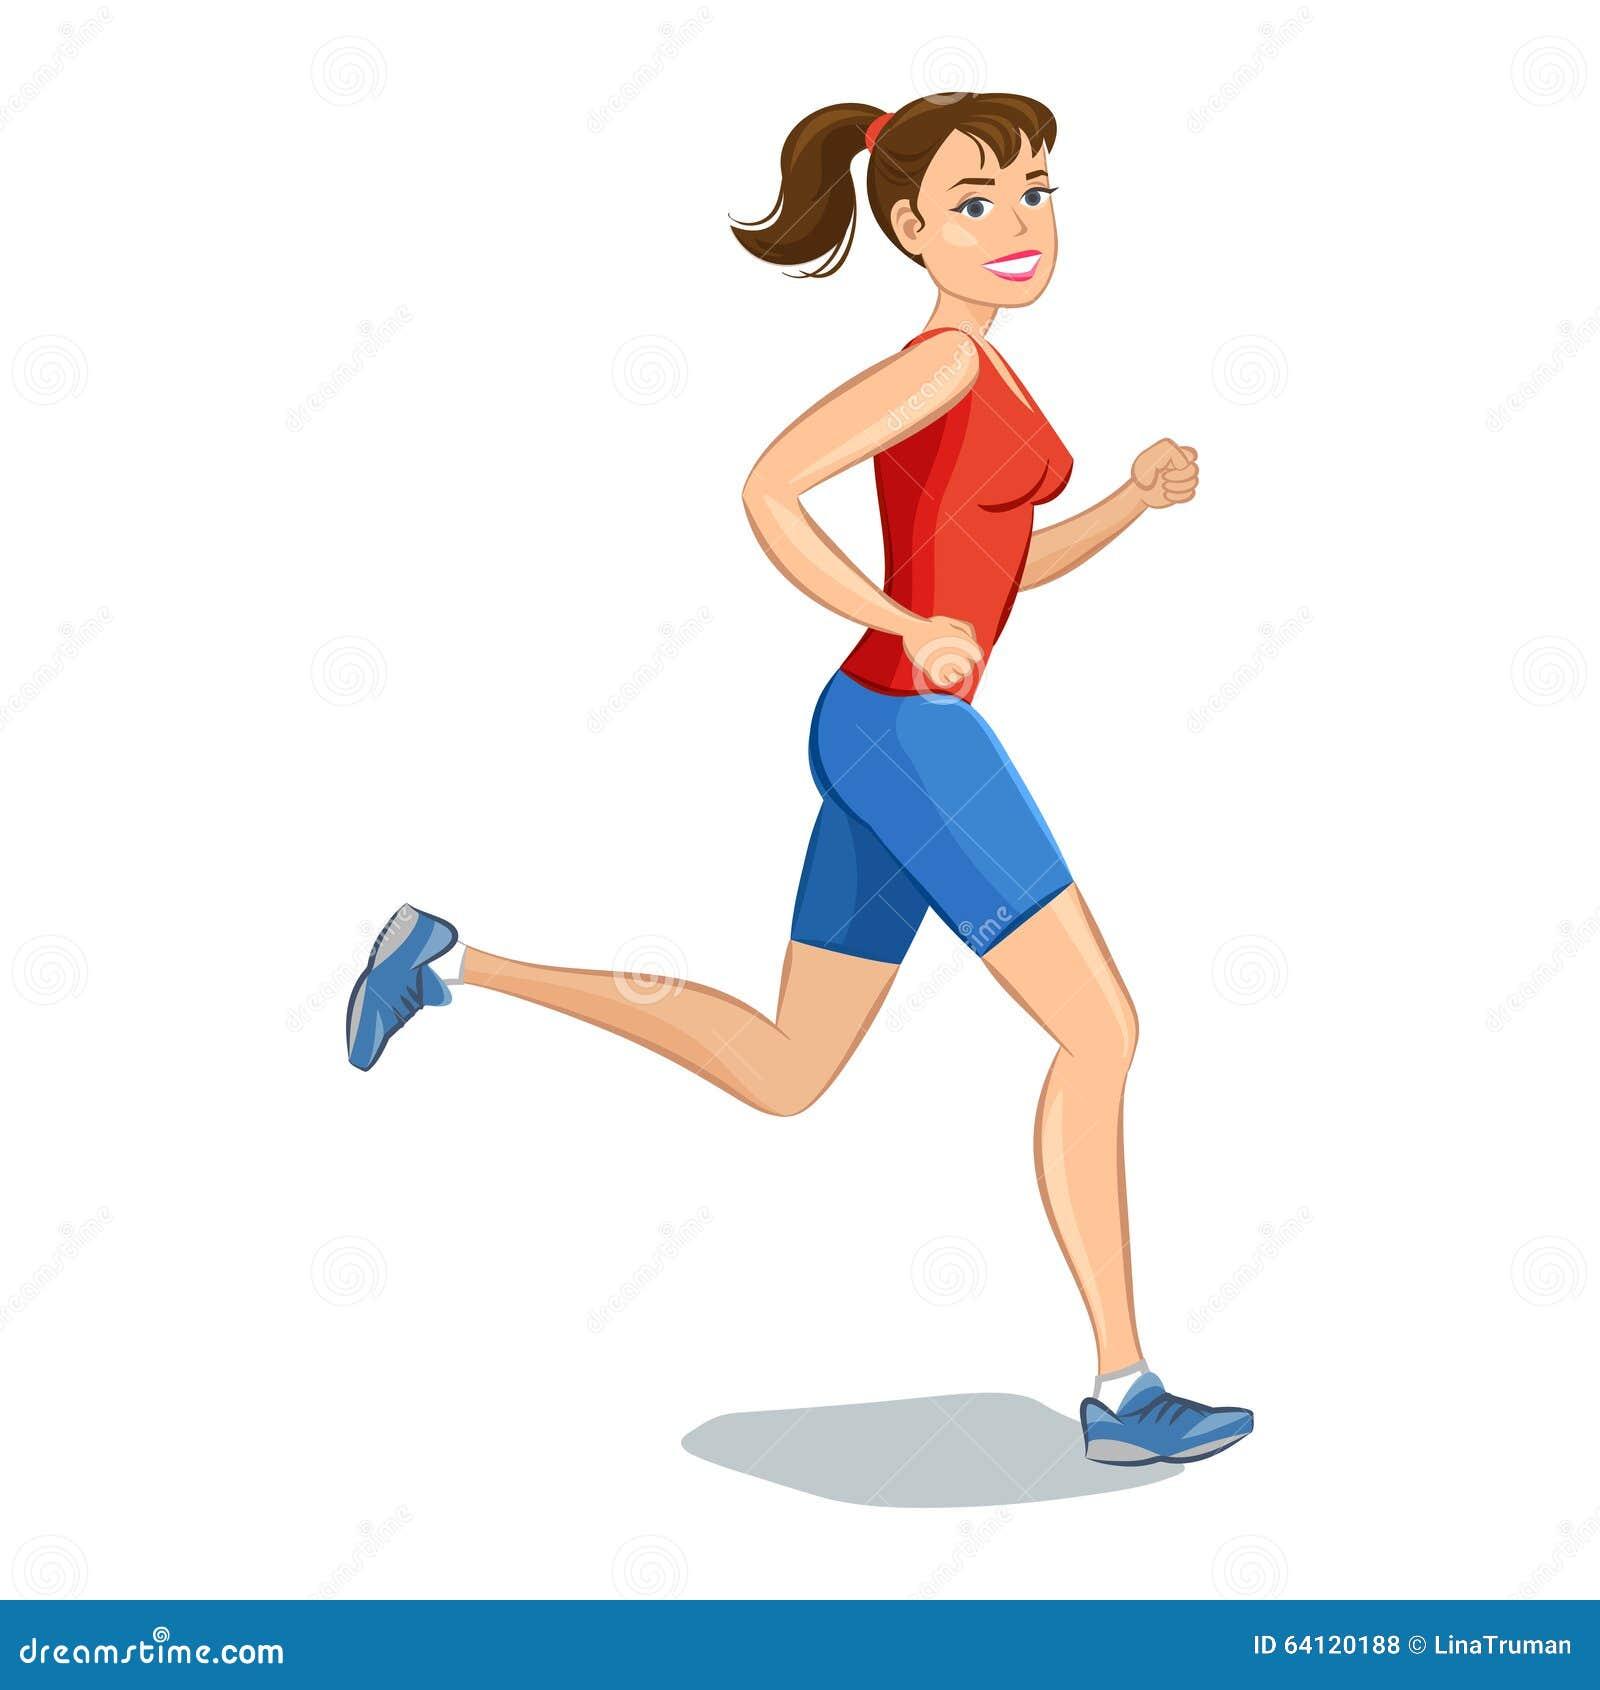 Smiling Cartoon Girl Jogging Beautiful Running Woman Stock Vector Illustration Of Healthy